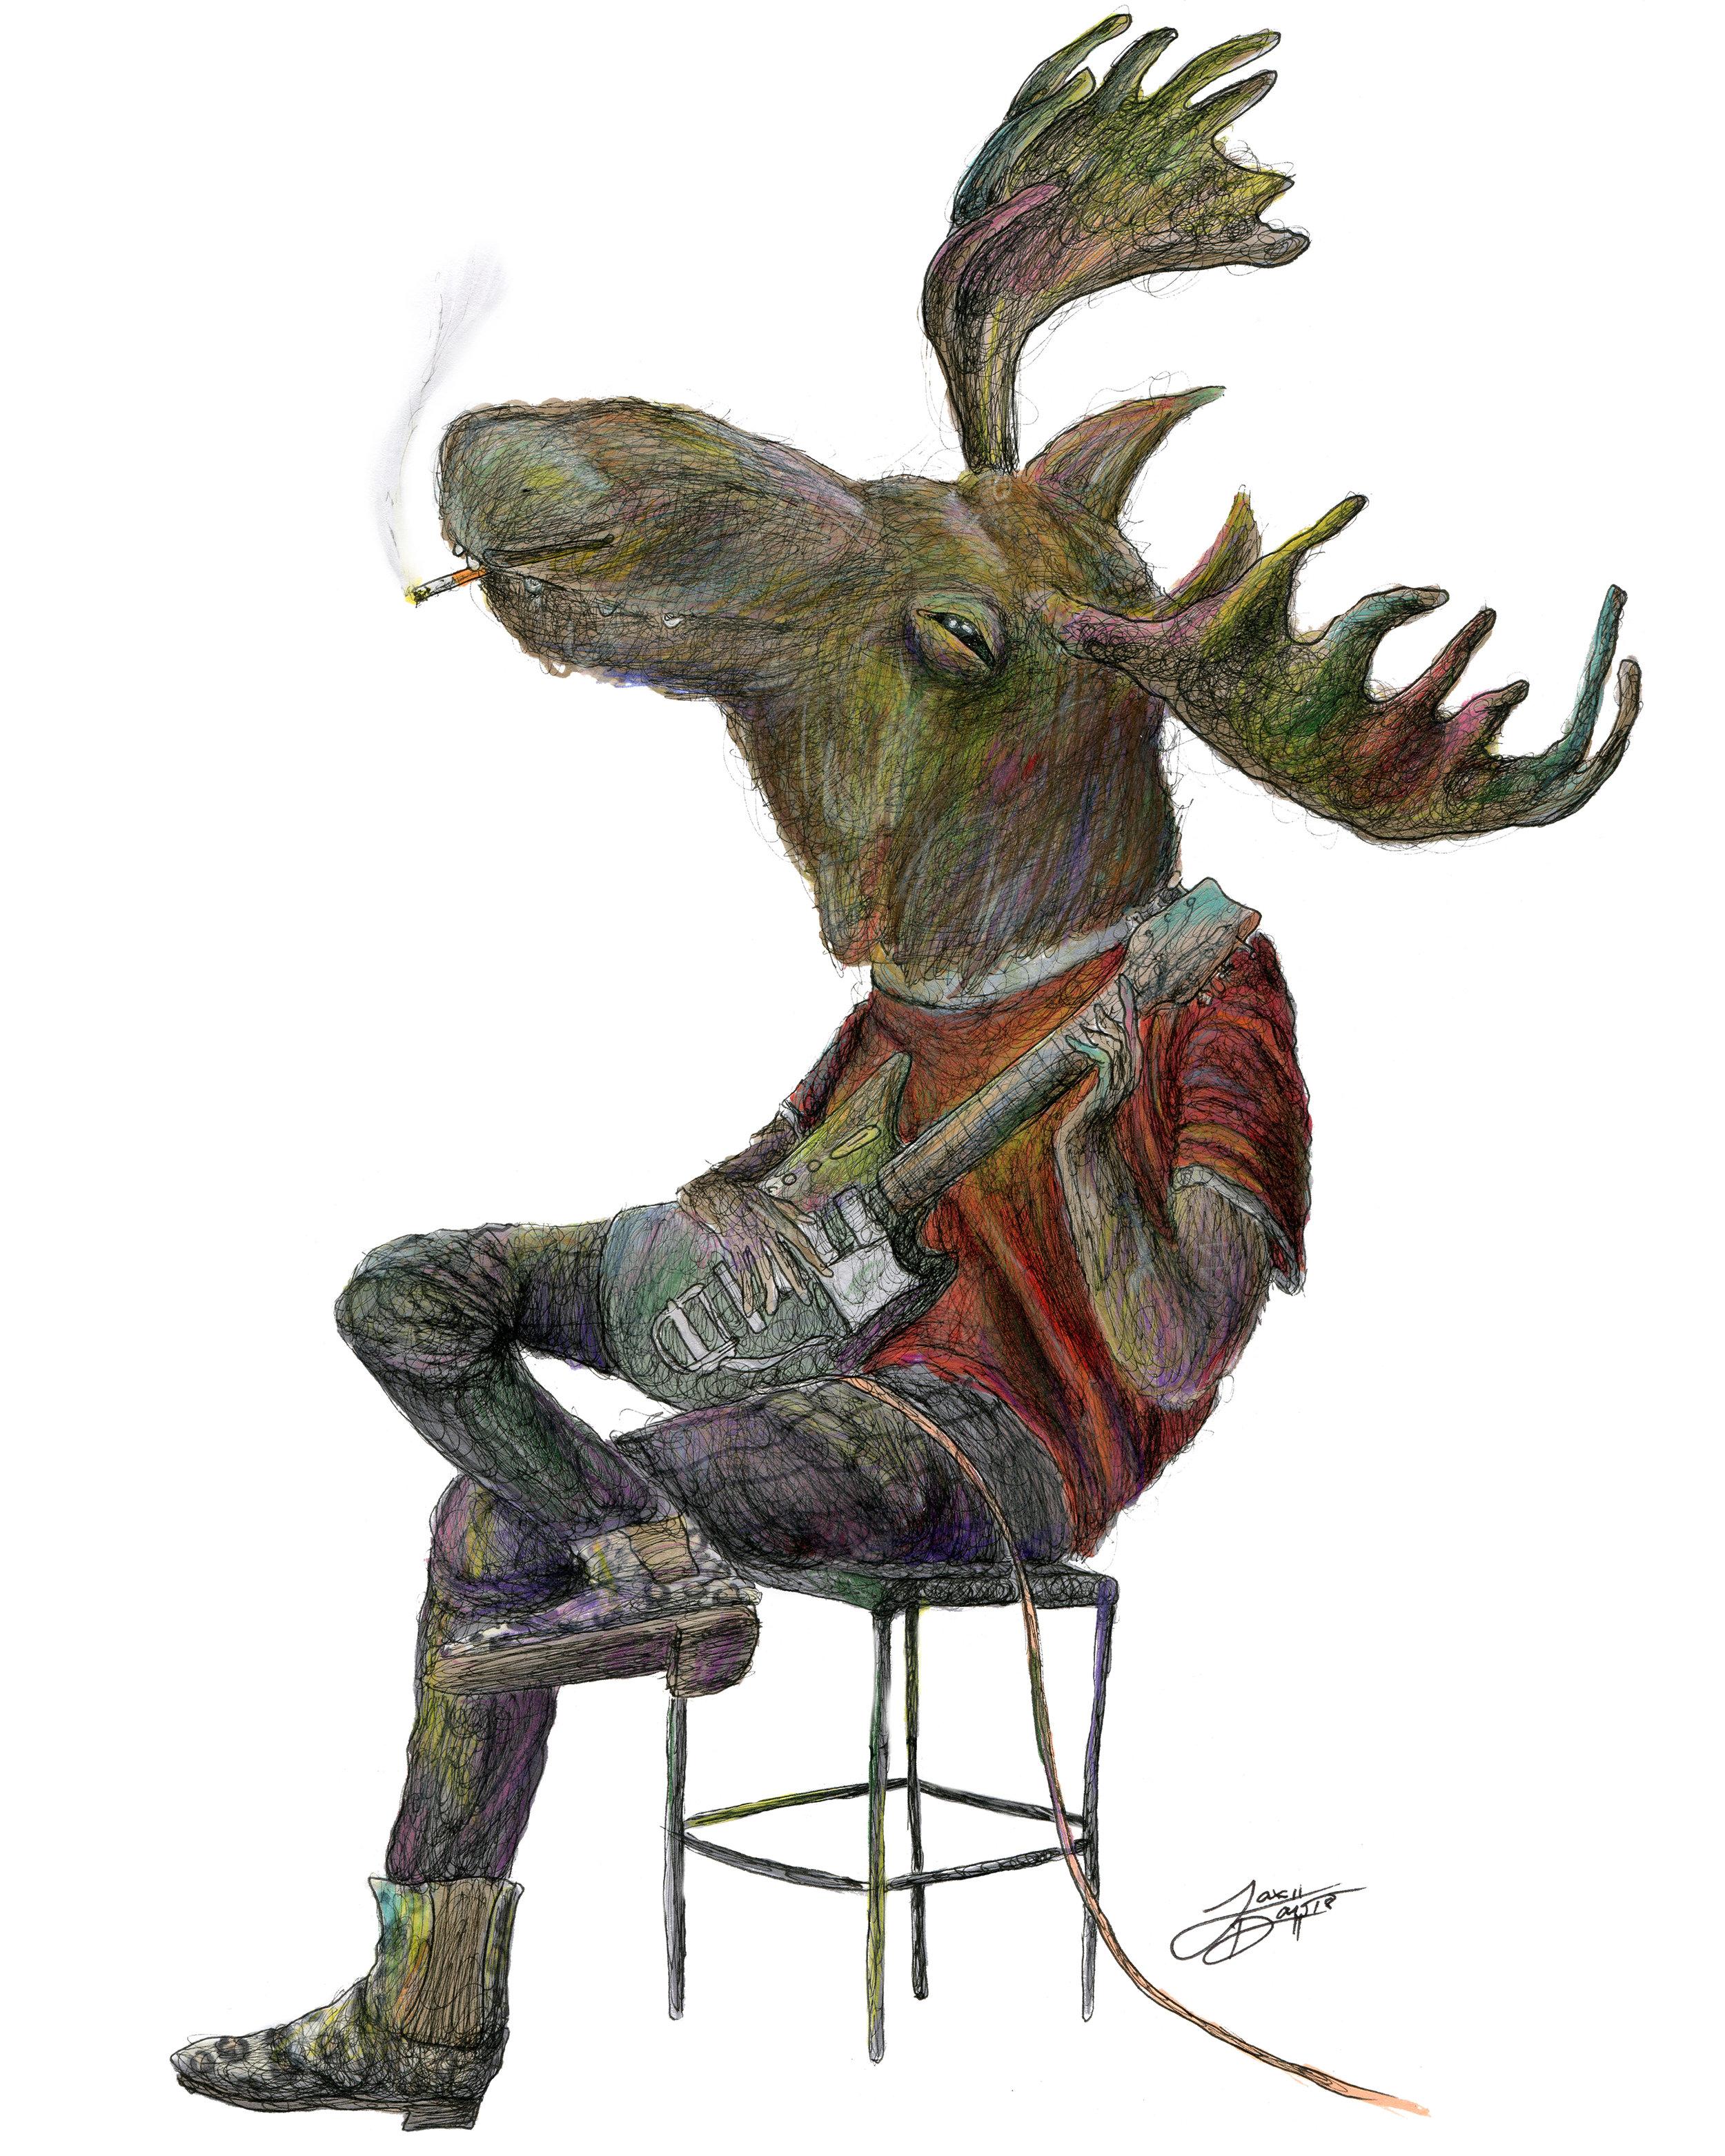 Mandy the Moose